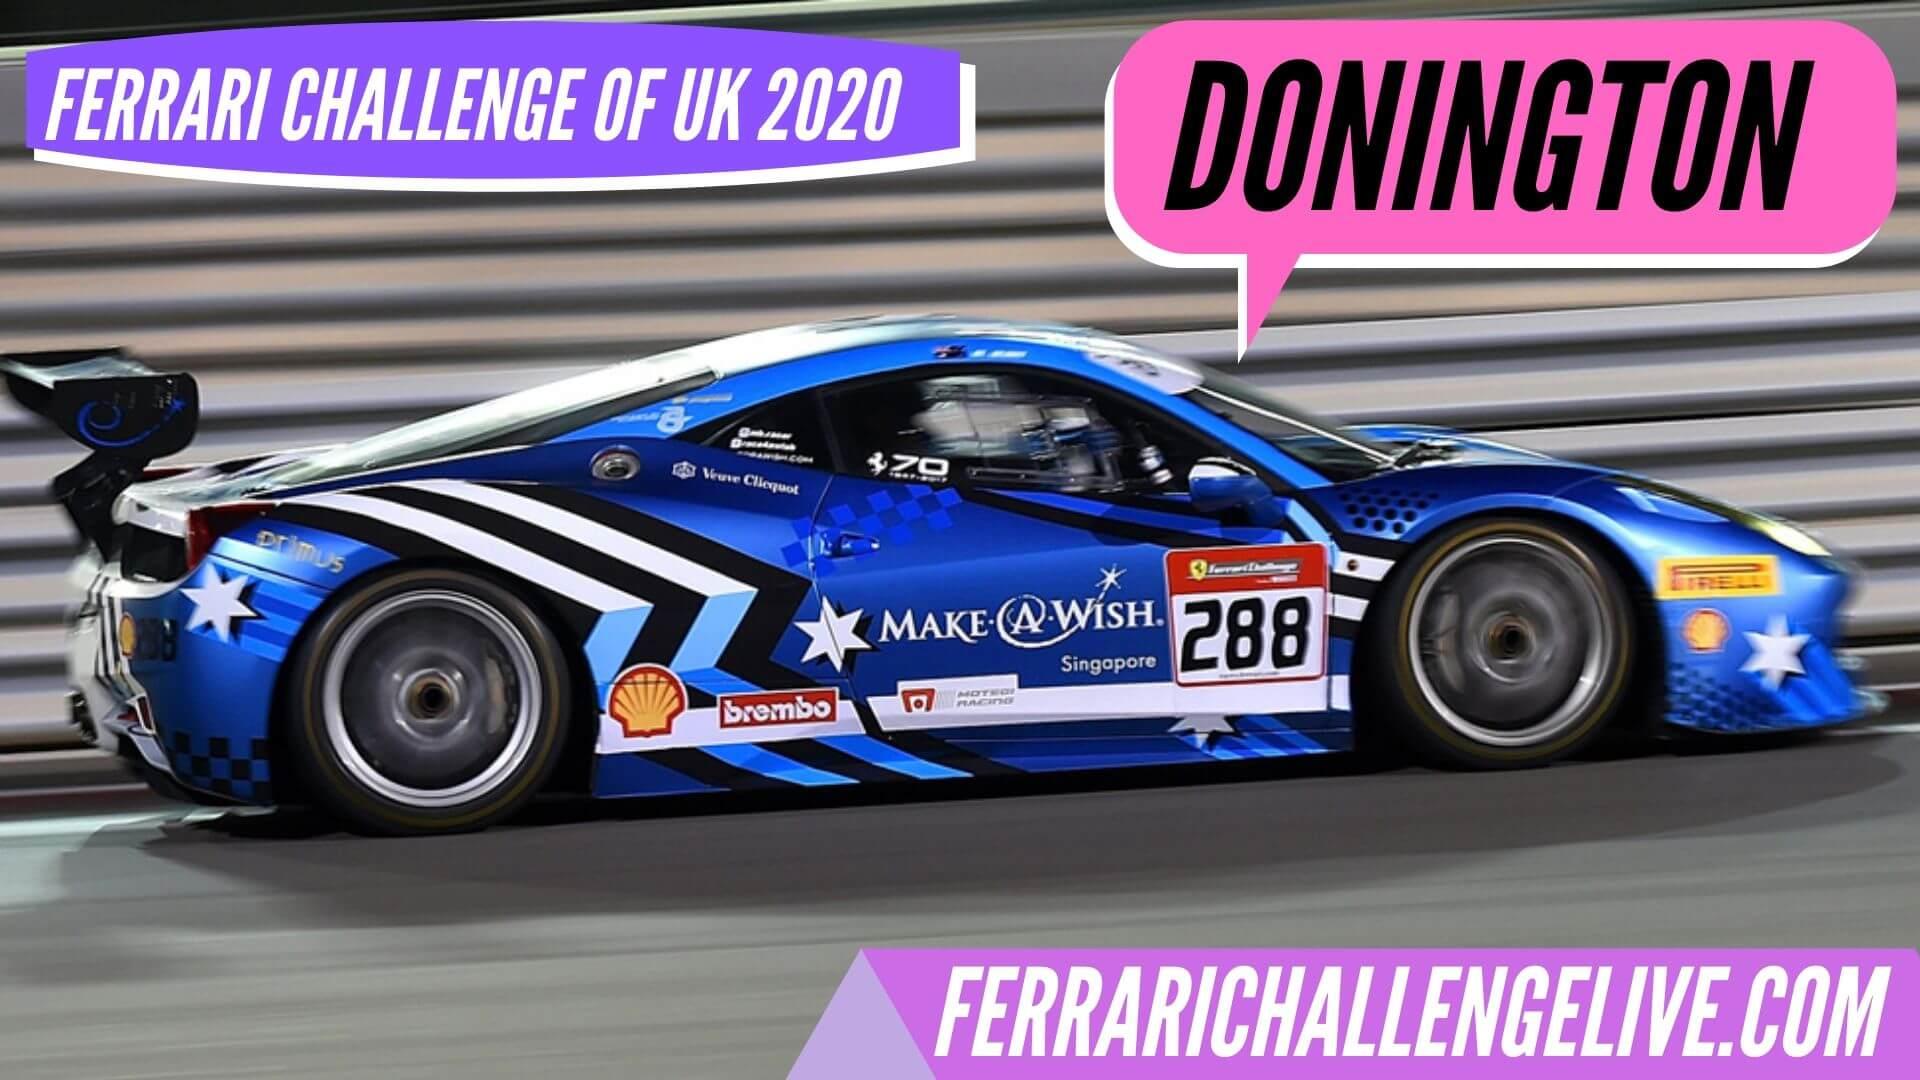 Donington Live Stream 2020 | Ferrari Challenge UK